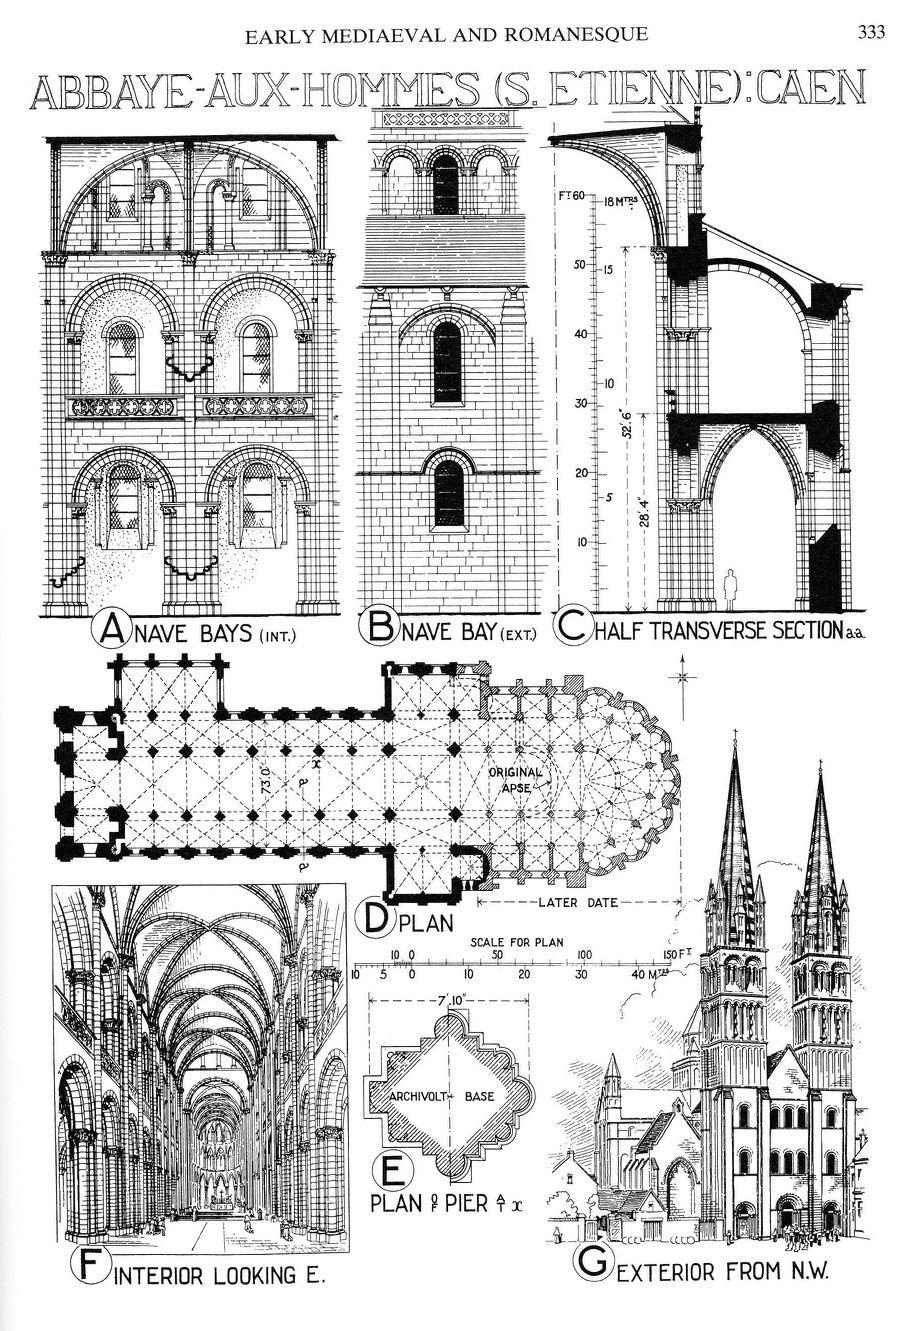 Ordre Des Architectes Amiens st. etienne, caen. from sir bannister fletcher's a history